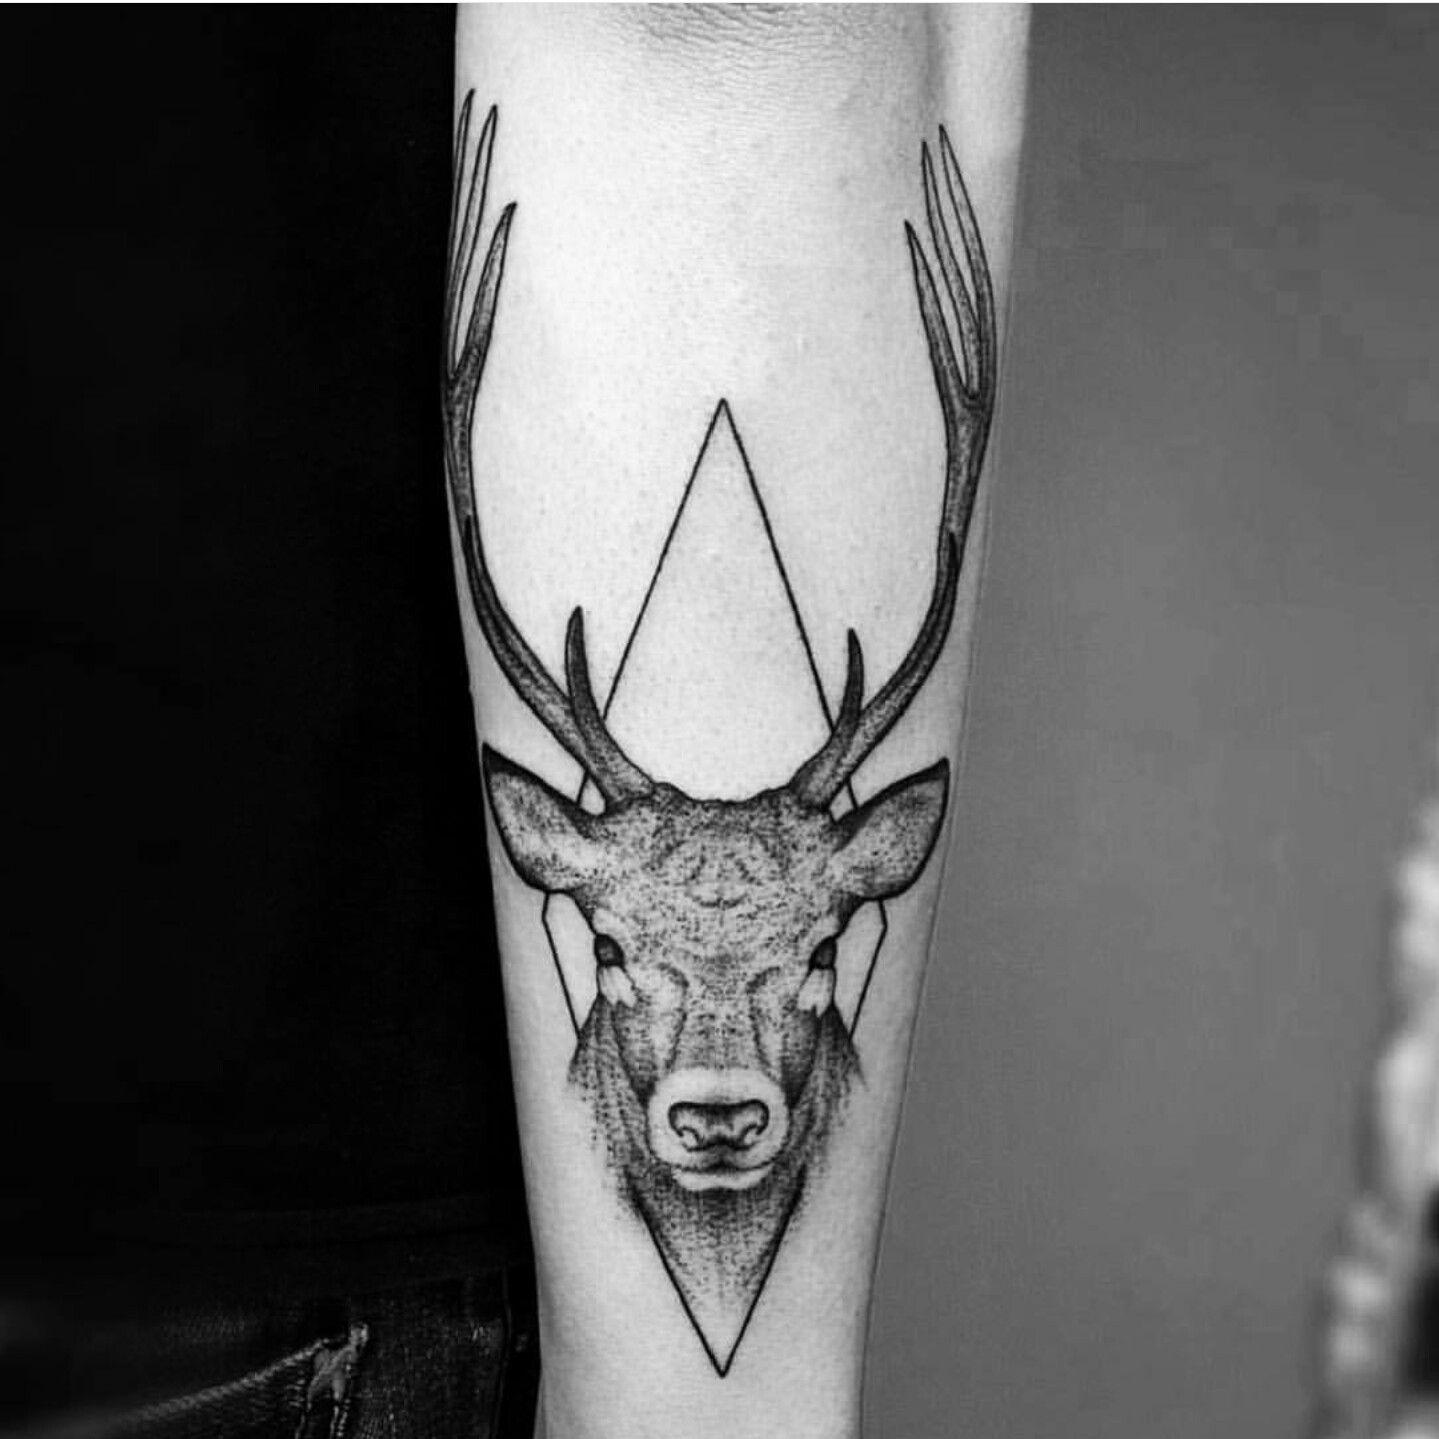 geometrisches tattoo hirsch nice tattoos pinterest tattoo trash polka and animal tattoos. Black Bedroom Furniture Sets. Home Design Ideas